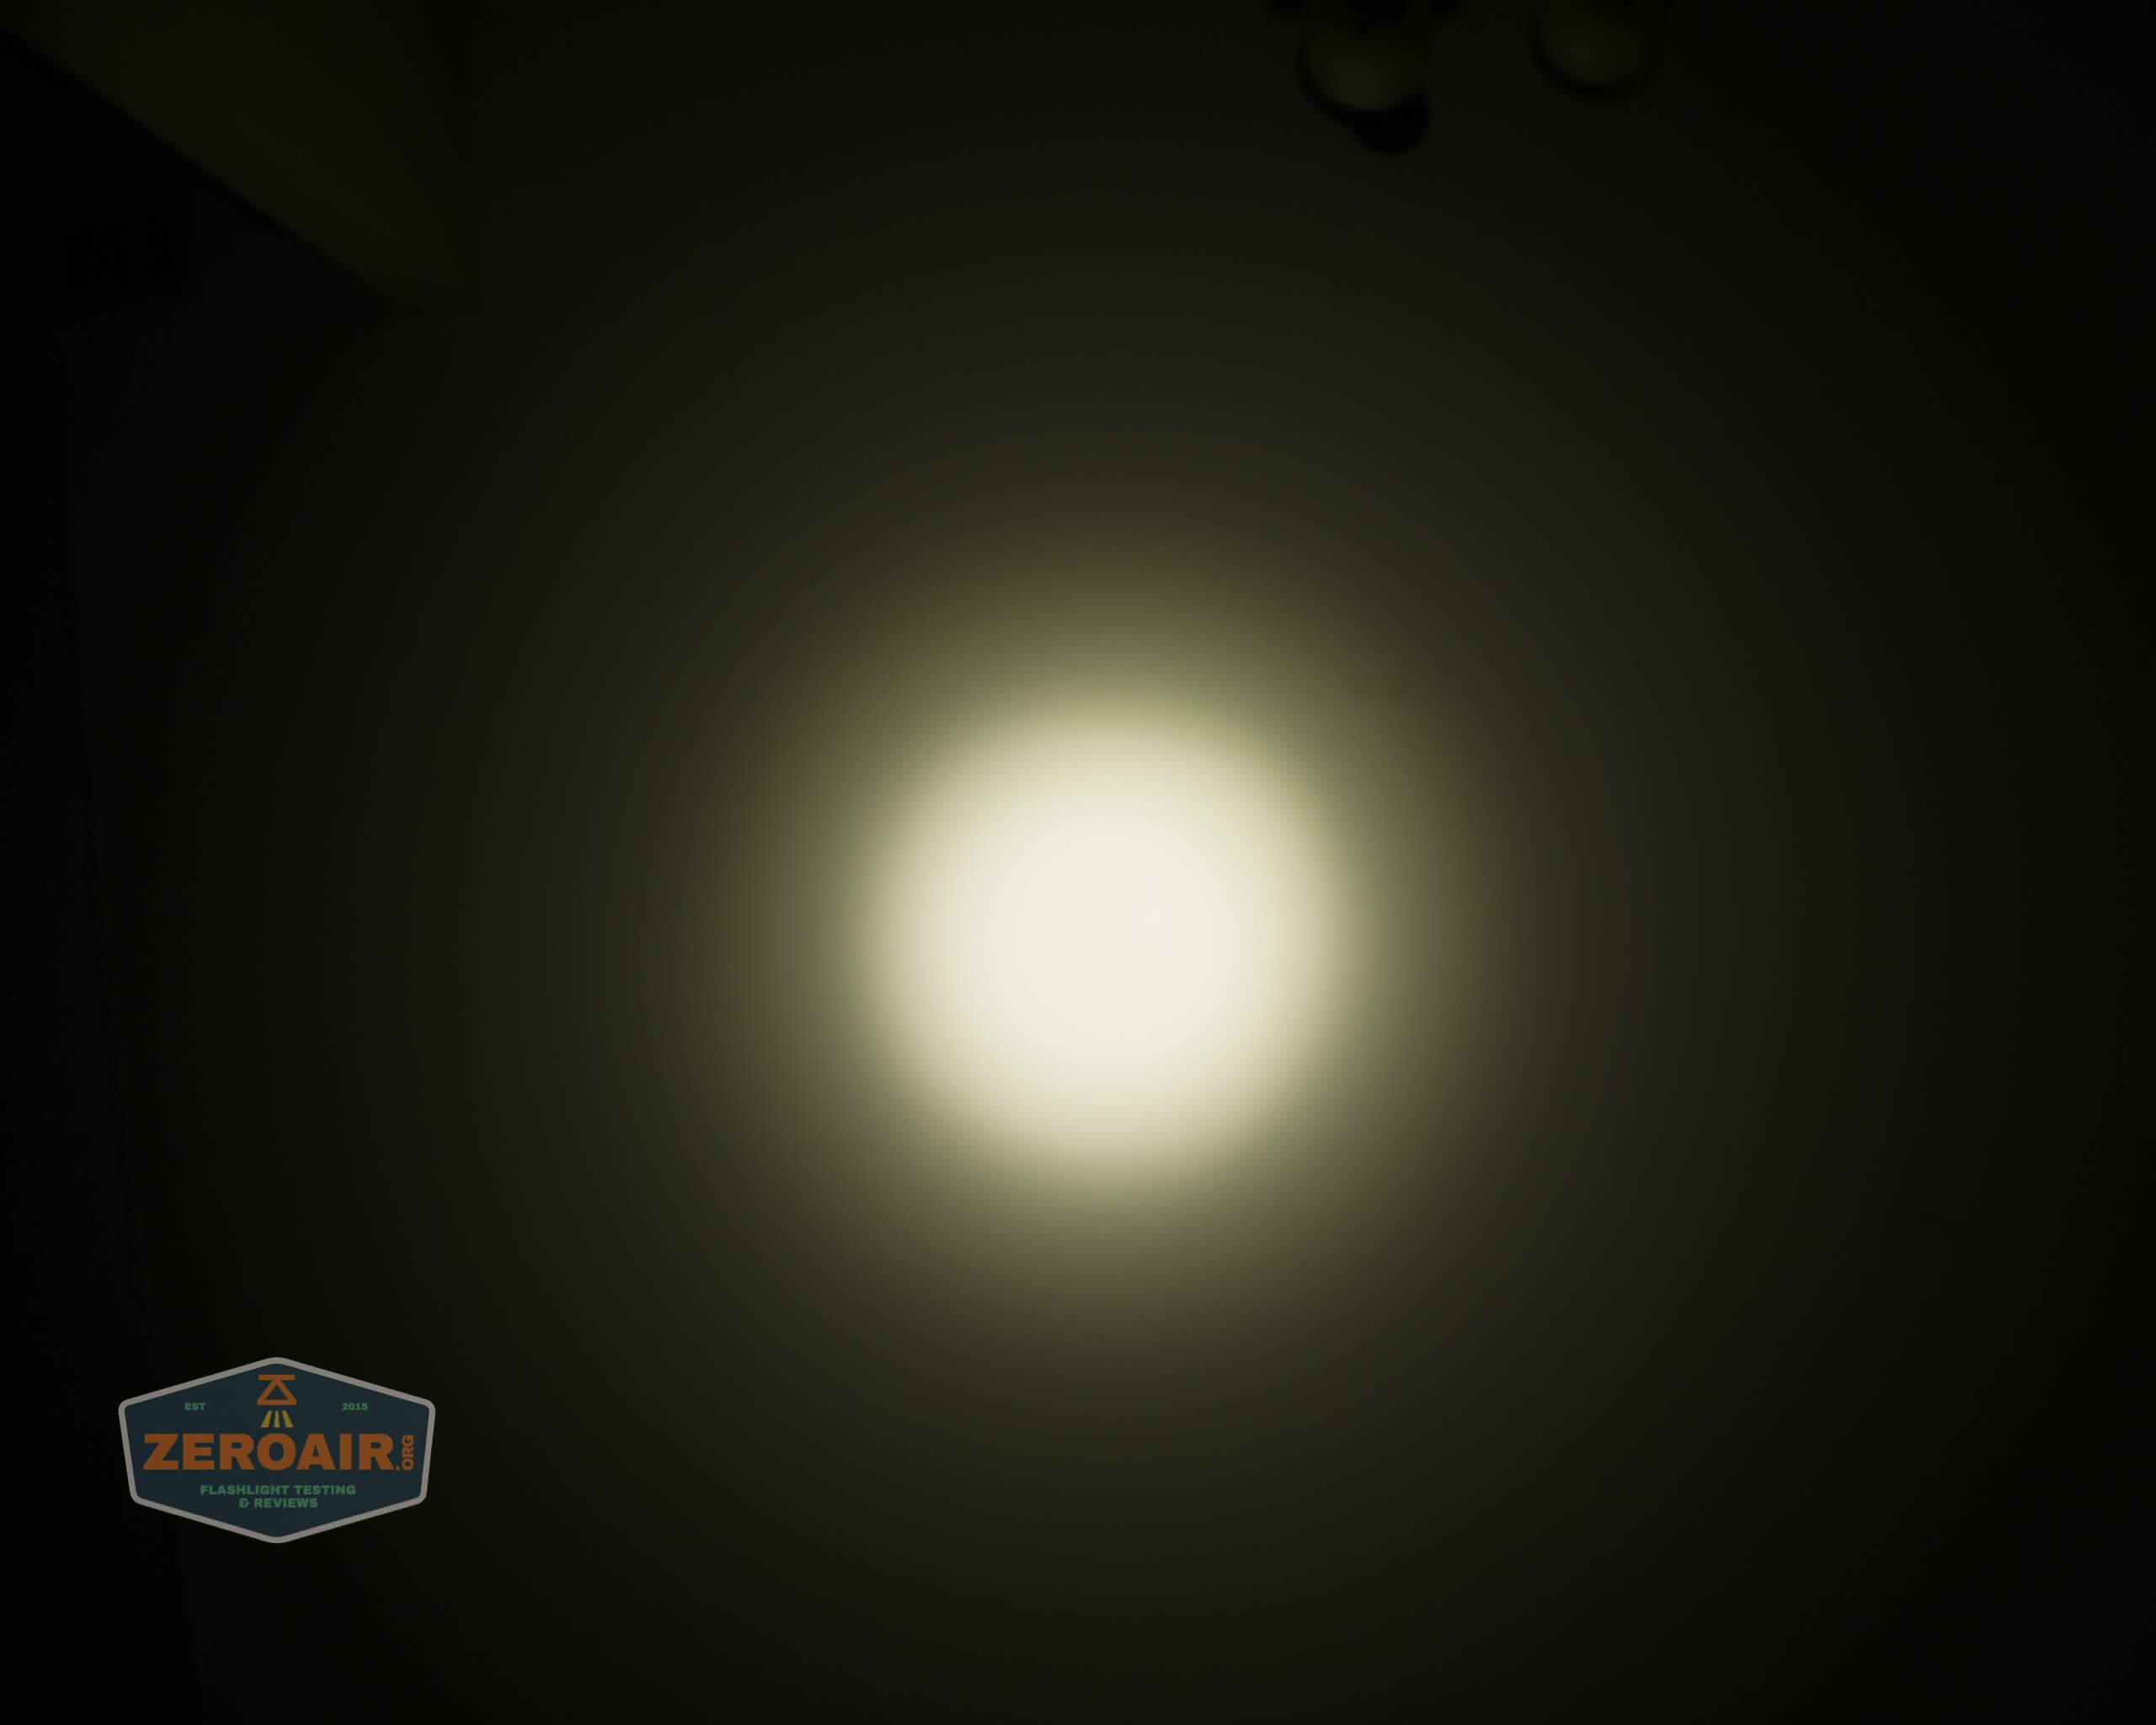 Olight m2r pro warrior beamshot ceiling 4